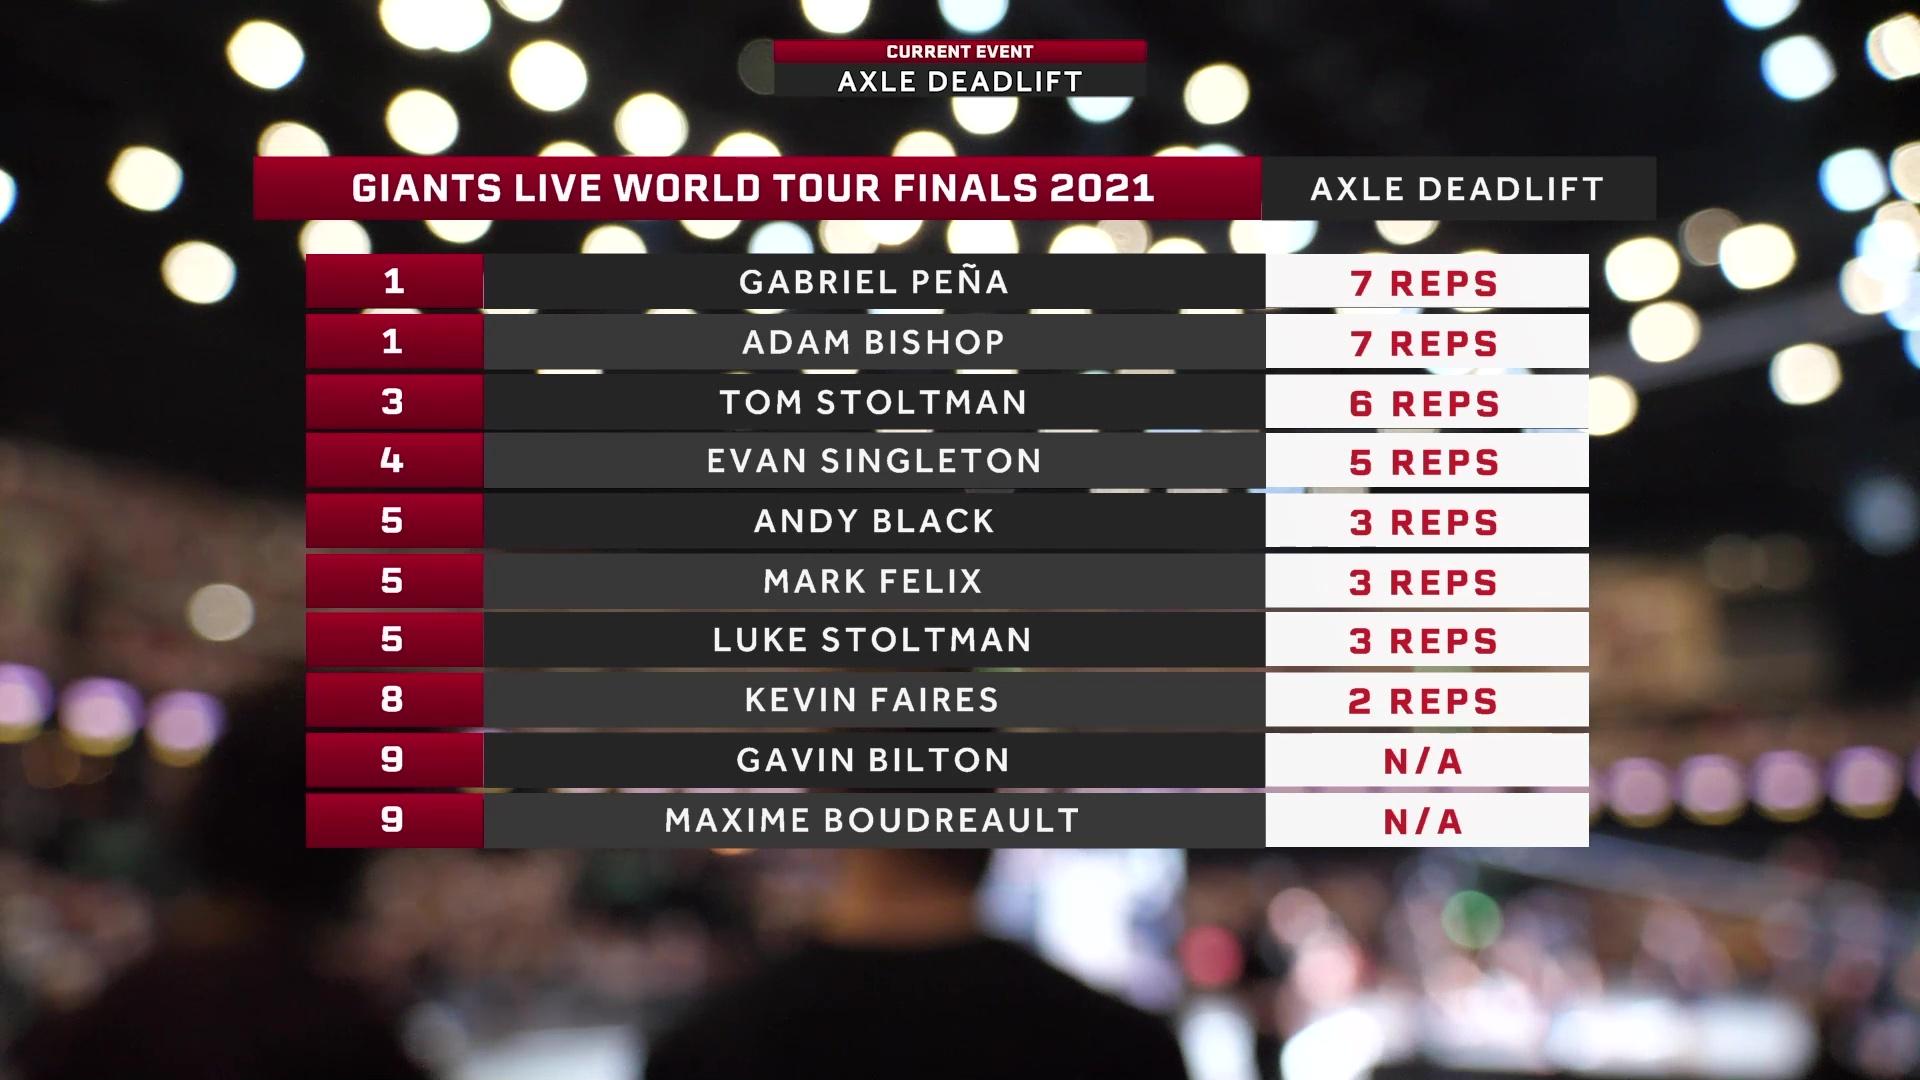 World Tour Finals Glasgow - Axle Deadlift